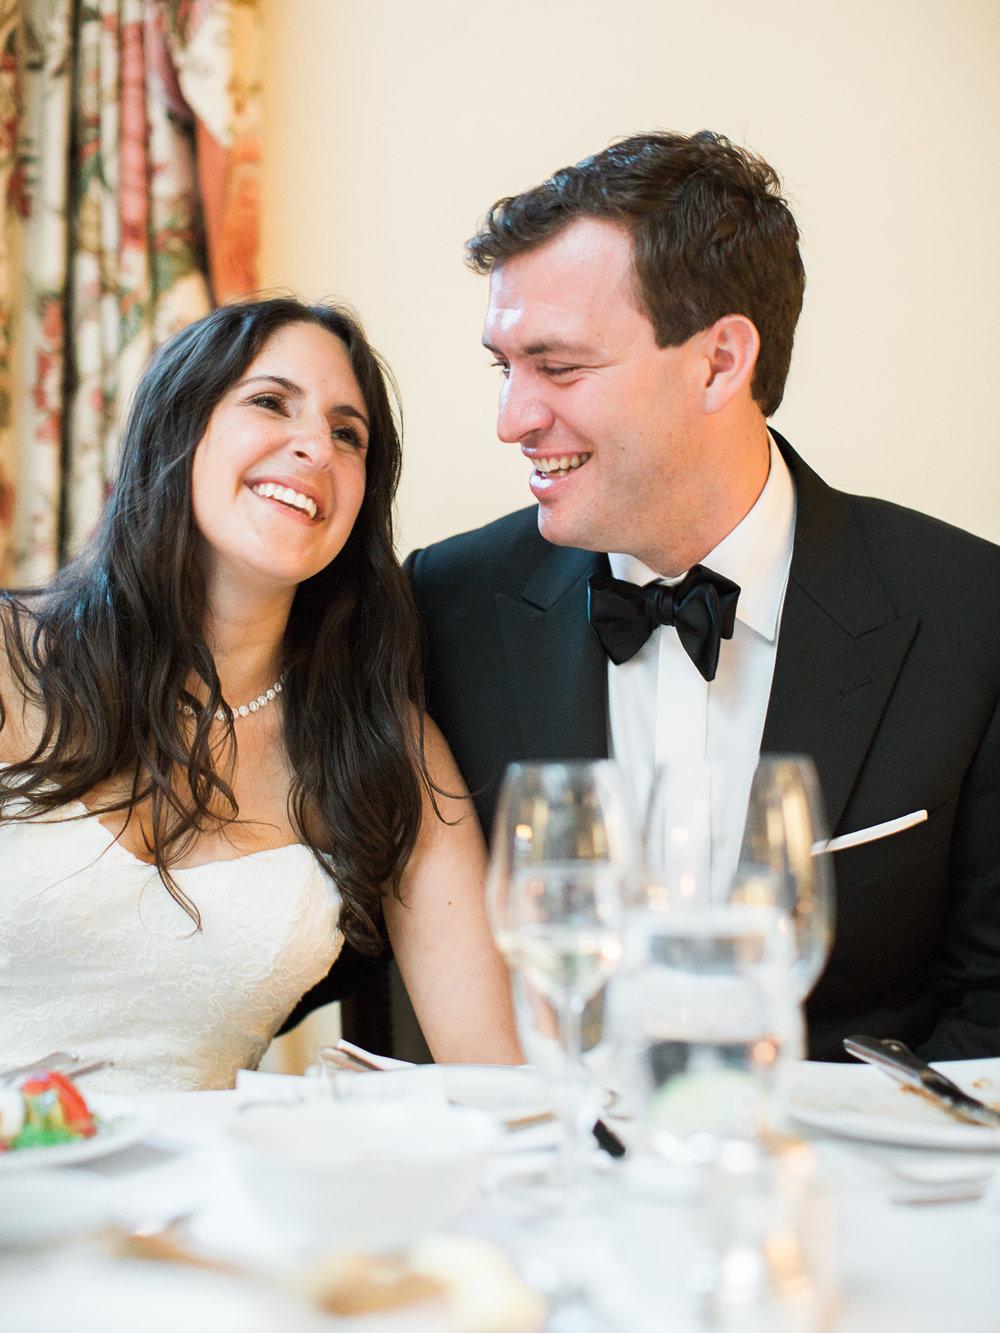 0180-Nadia-Chris-Married-When He Founf Her-Toronto Golf Club.jpg